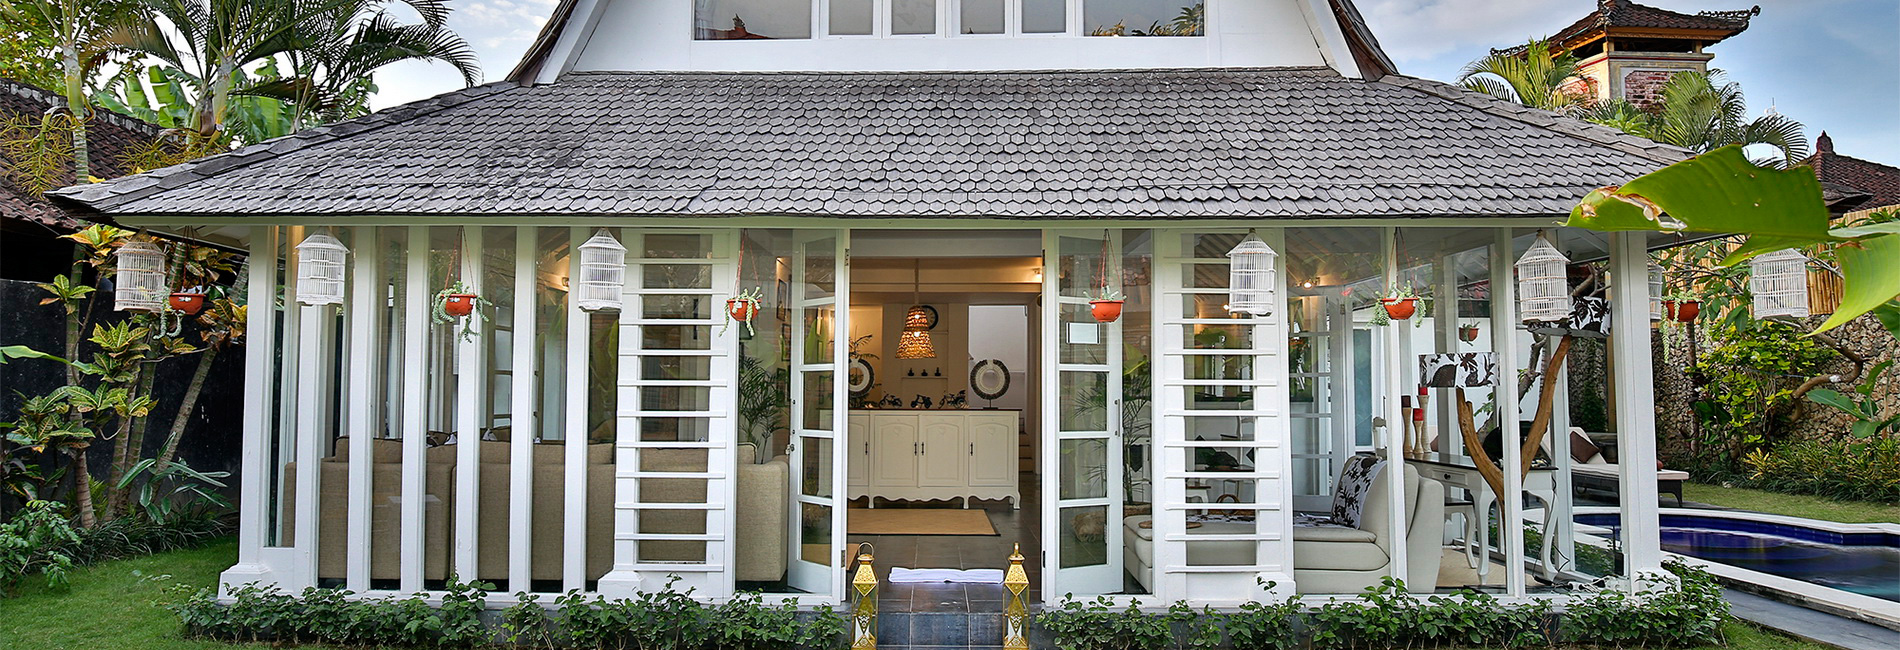 Villa Abida 2 bedroom villa in Seminyak, Bali. Photo by Asia Holiday Retreats.